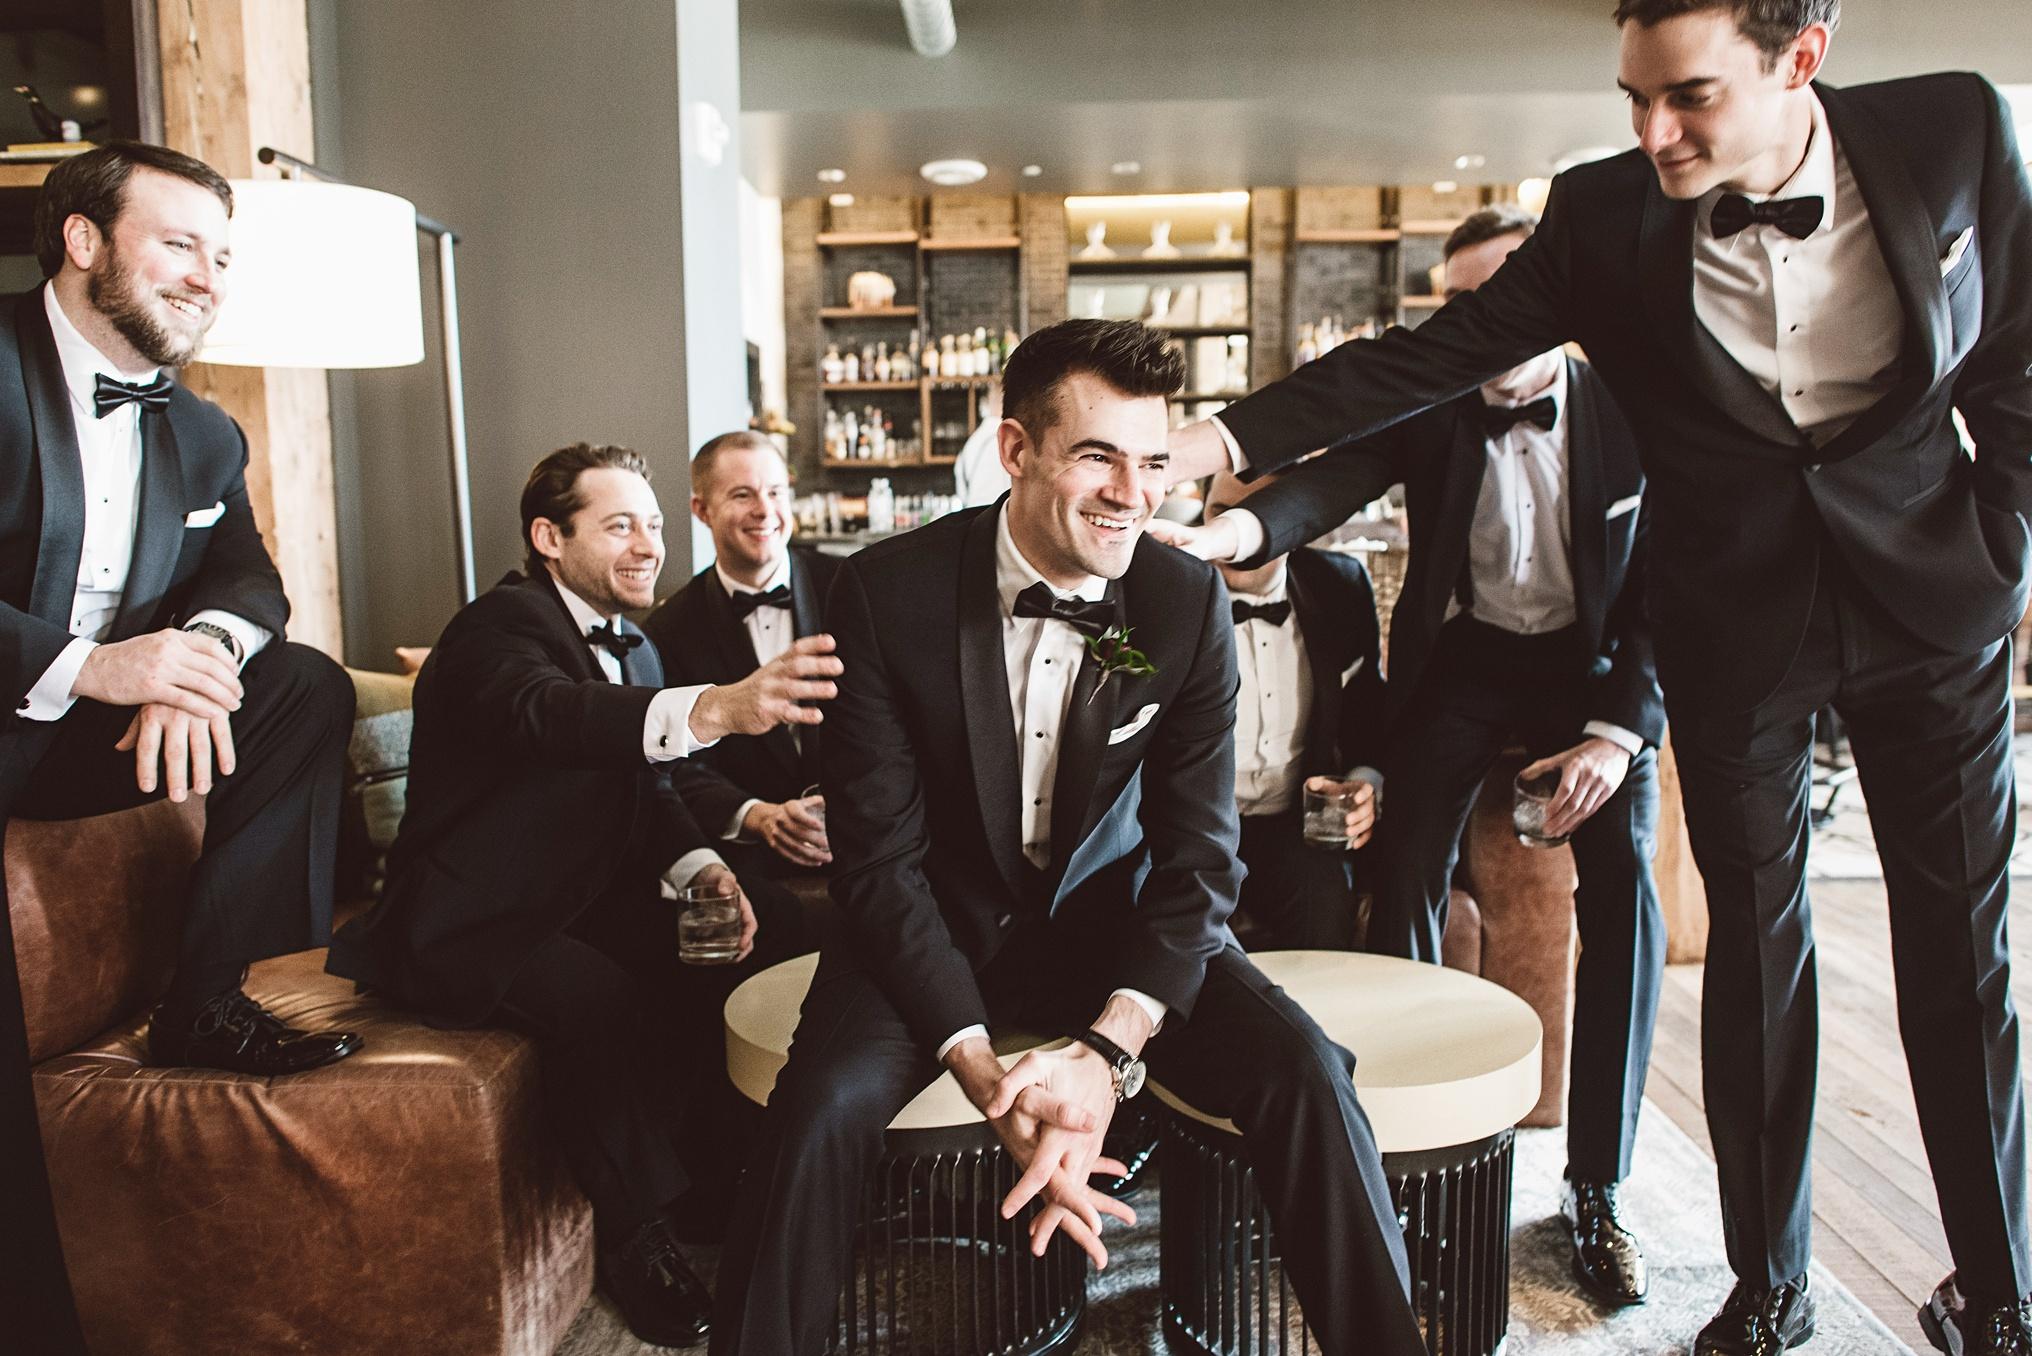 best_wedding_photography_2017_by_lucas_botz_photography_138.jpg